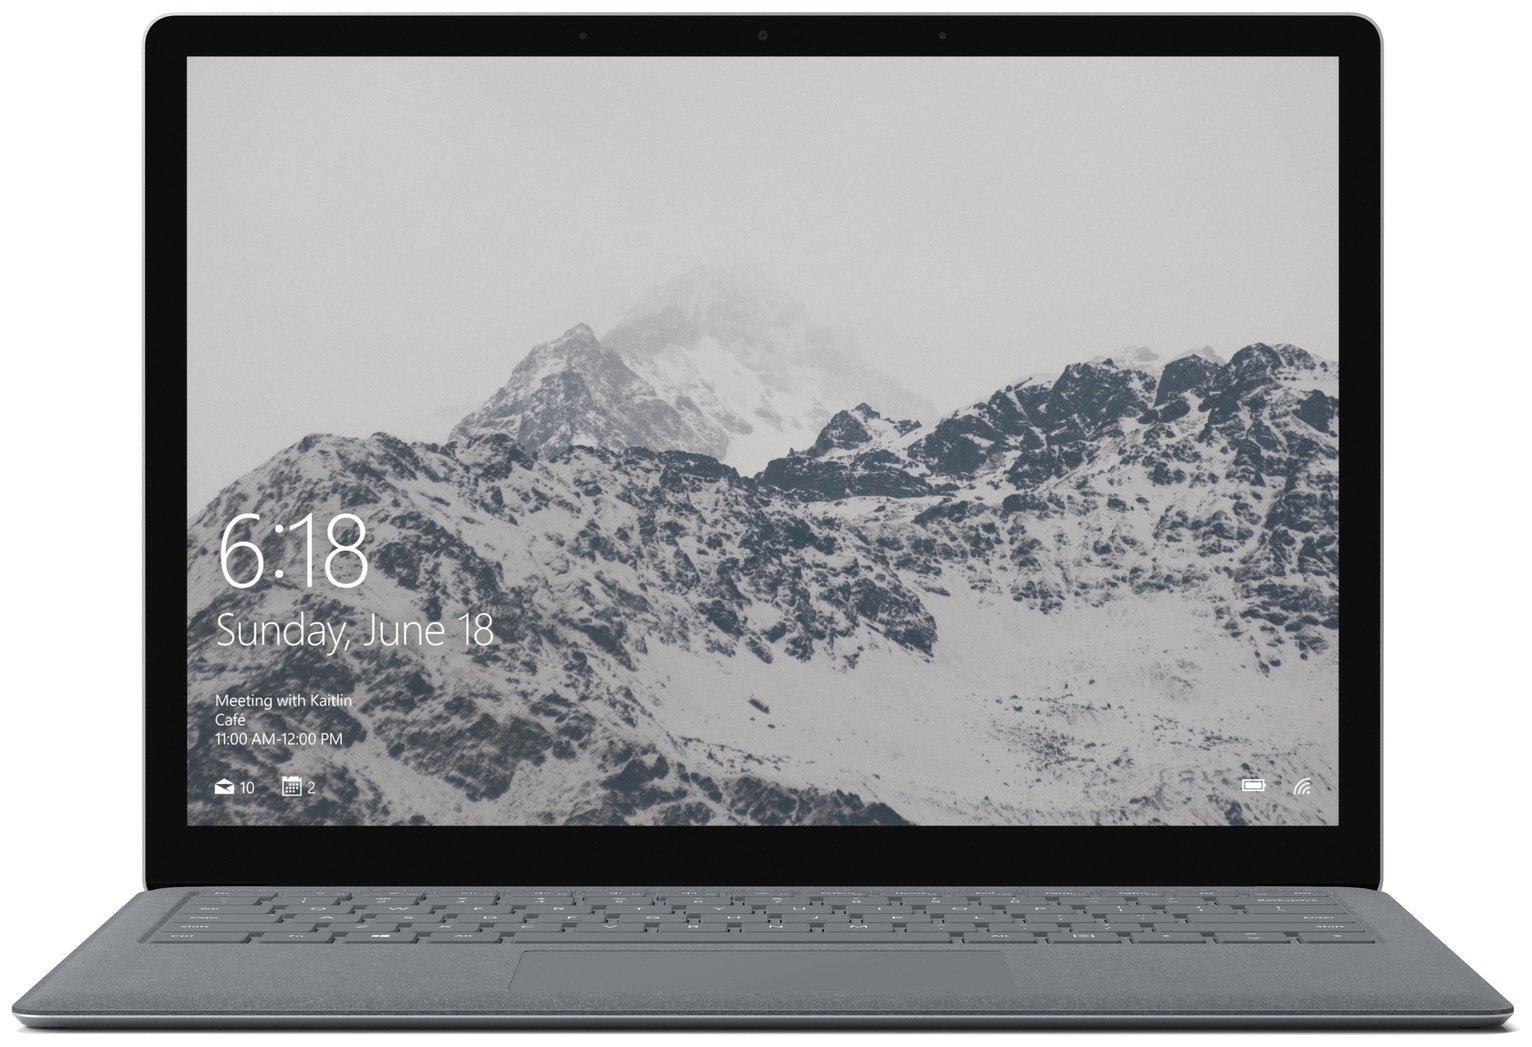 Microsoft surface Microsoft Surface 13.5 Inch i5 8GB 256GB Laptop - Platinum